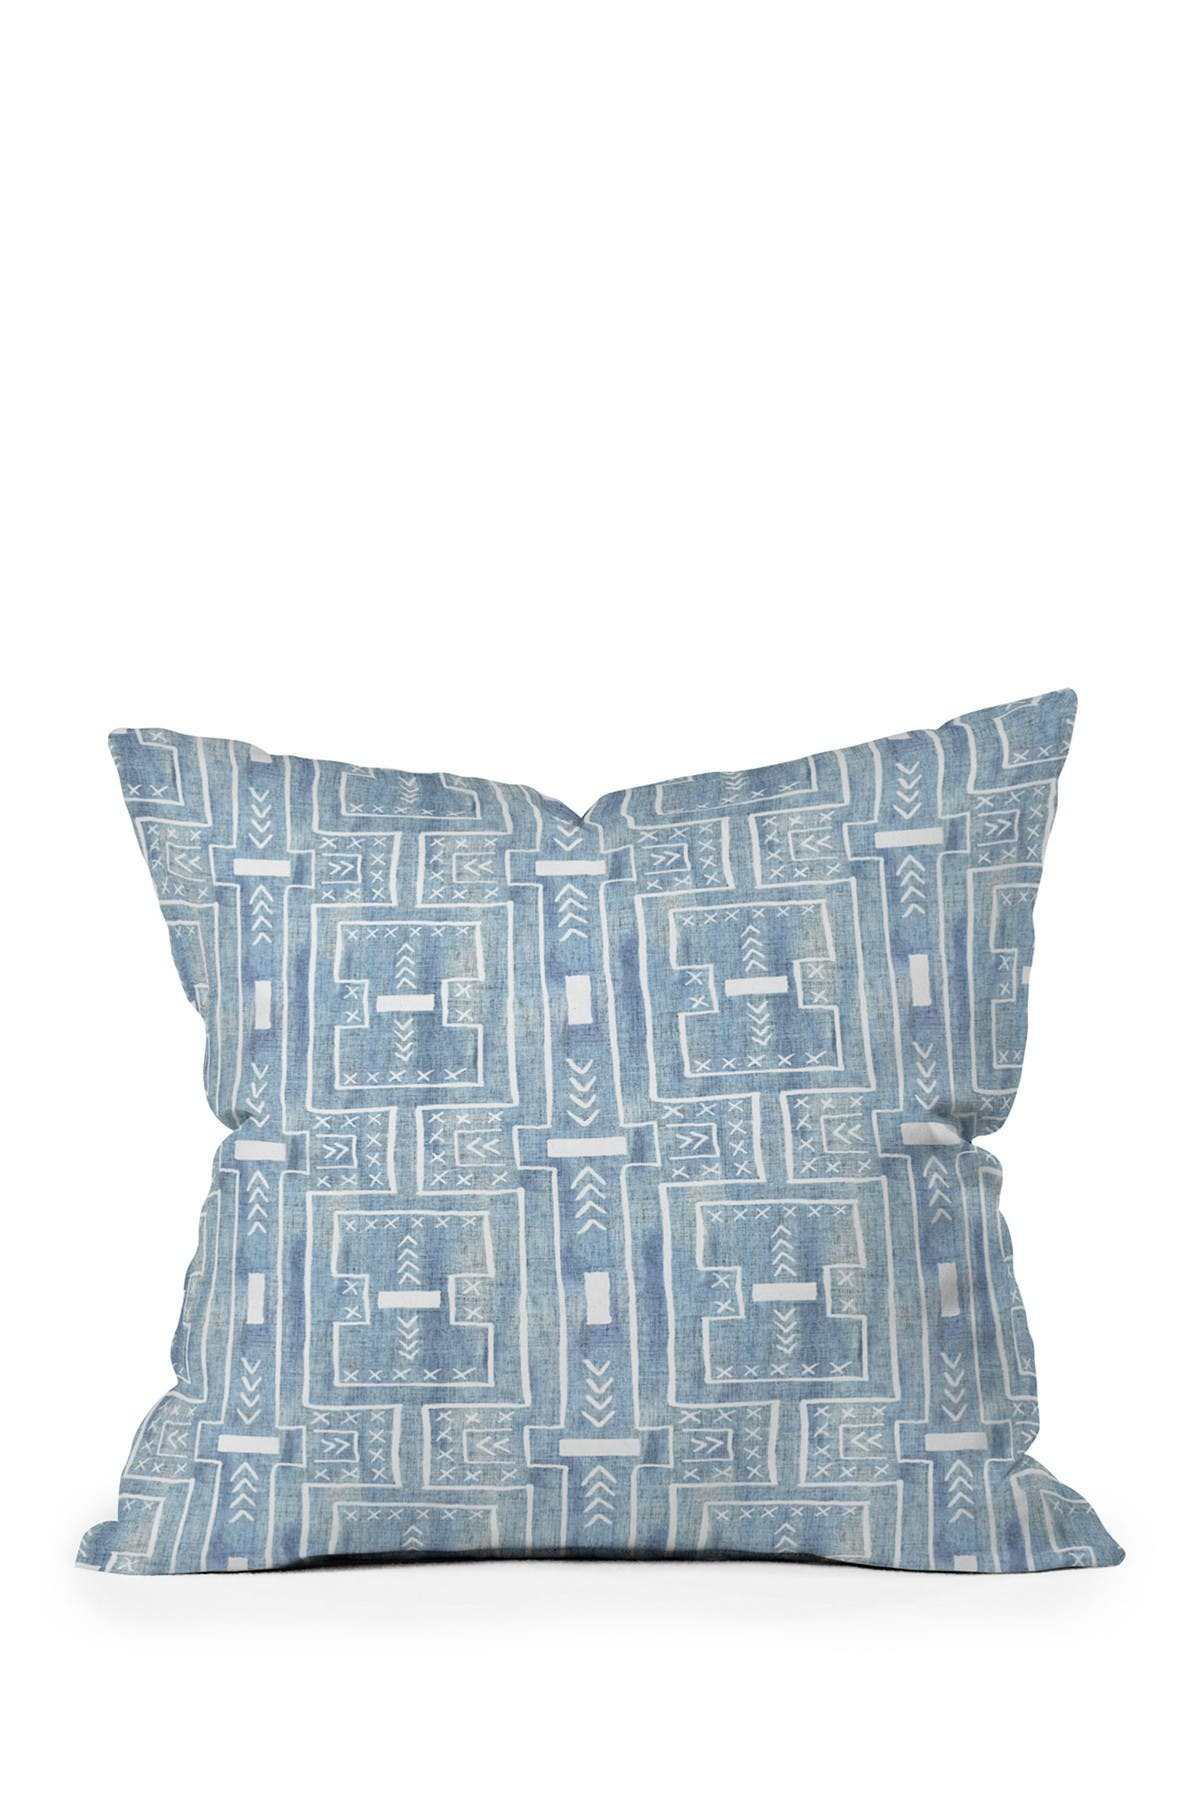 Deny Designs Schatzi Brown Modern Mud Cloth Light Square Throw Pillow Nordstrom Rack